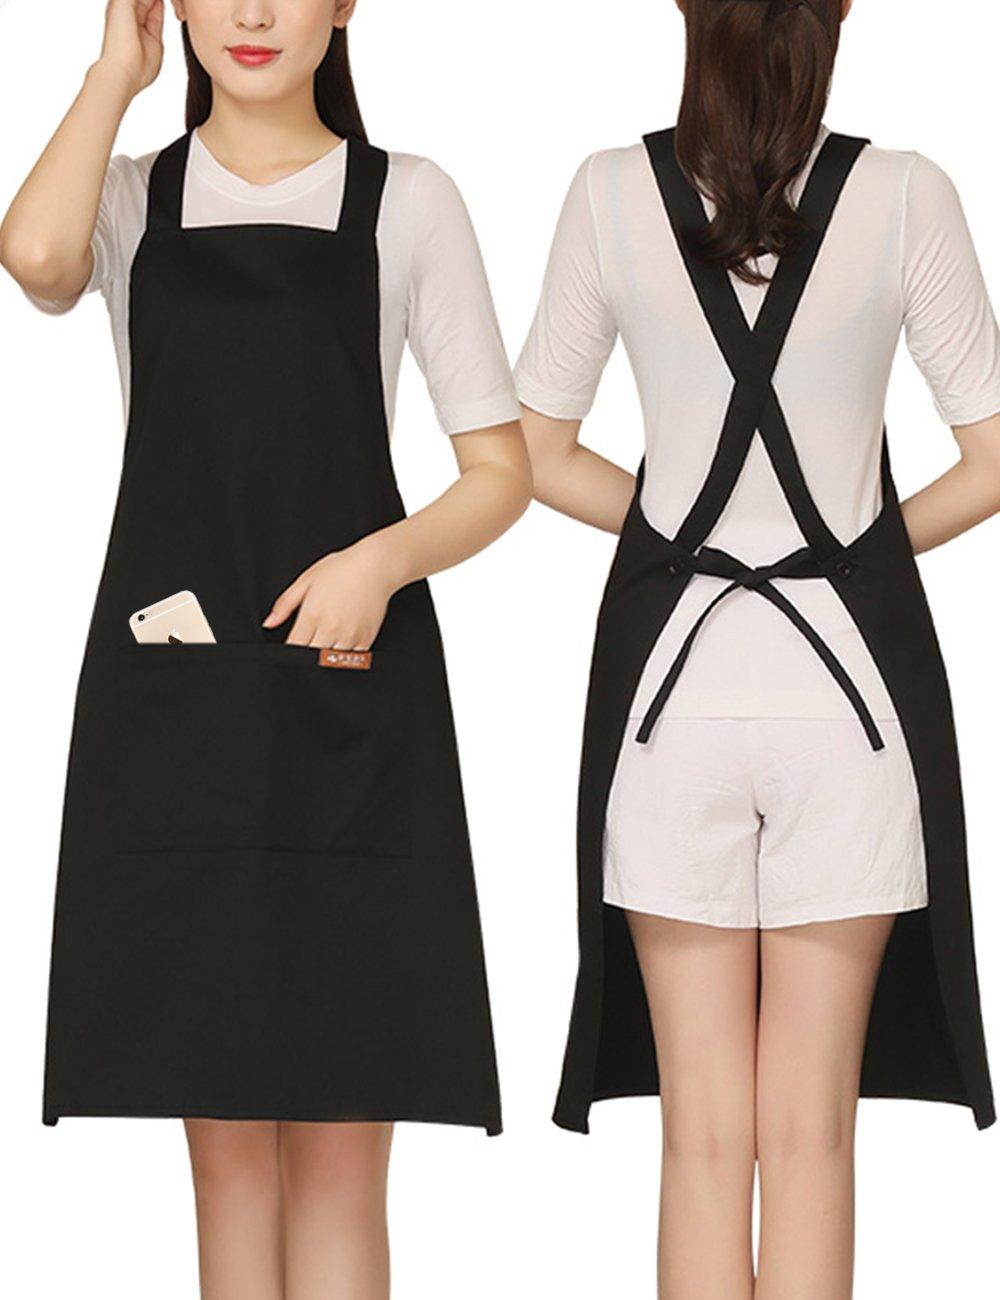 Adjustable Grilling Apron with 2 Pockets Cotton for Stylist,Barber,Teacher,Cobbler Fits for Paint,Vintage,Baking Wine Color Black